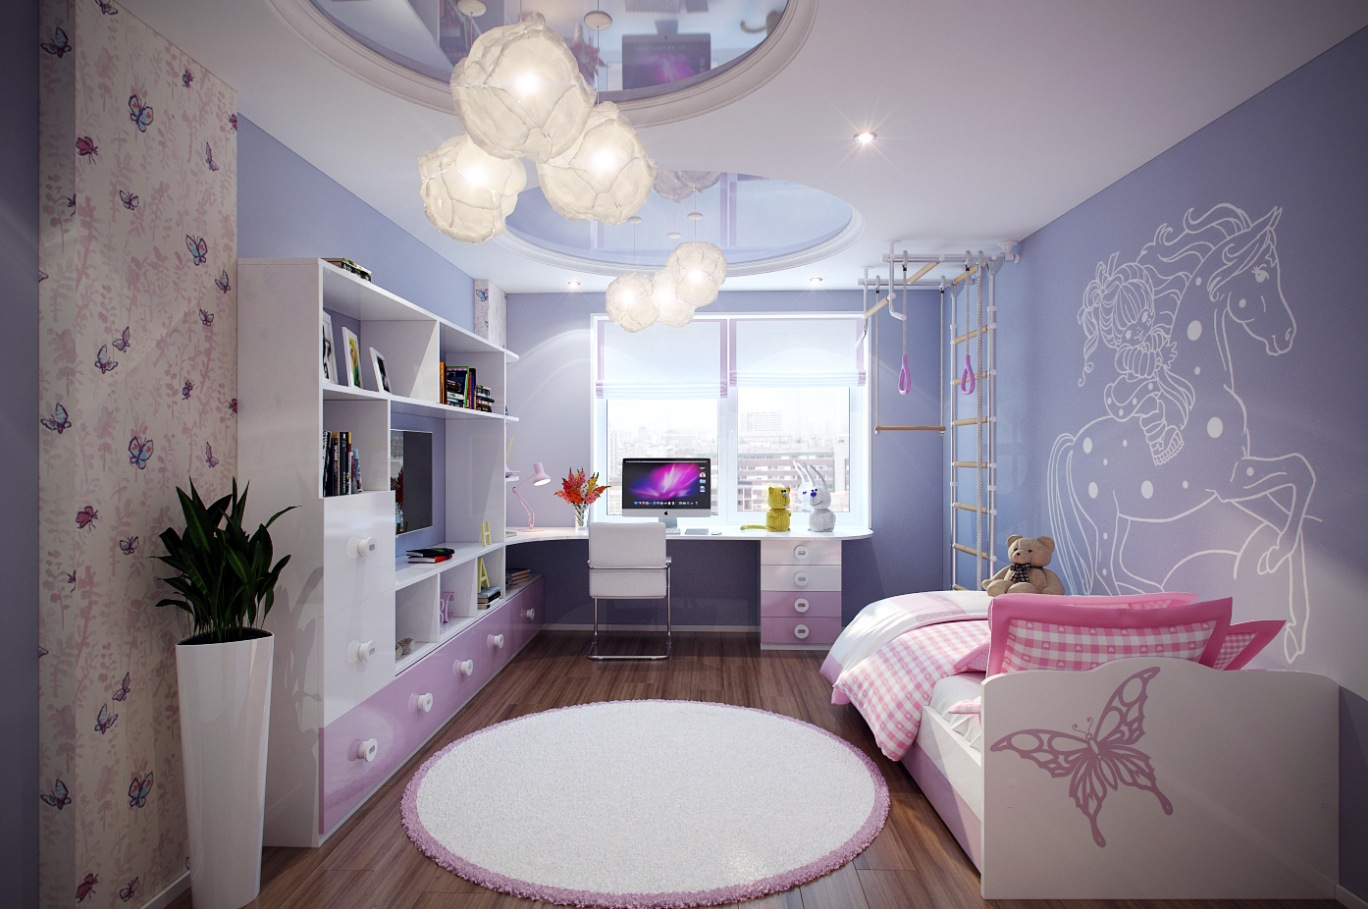 صور ديكورات غرف نوم اطفال , تصاميم غرف اطفال مختلفة